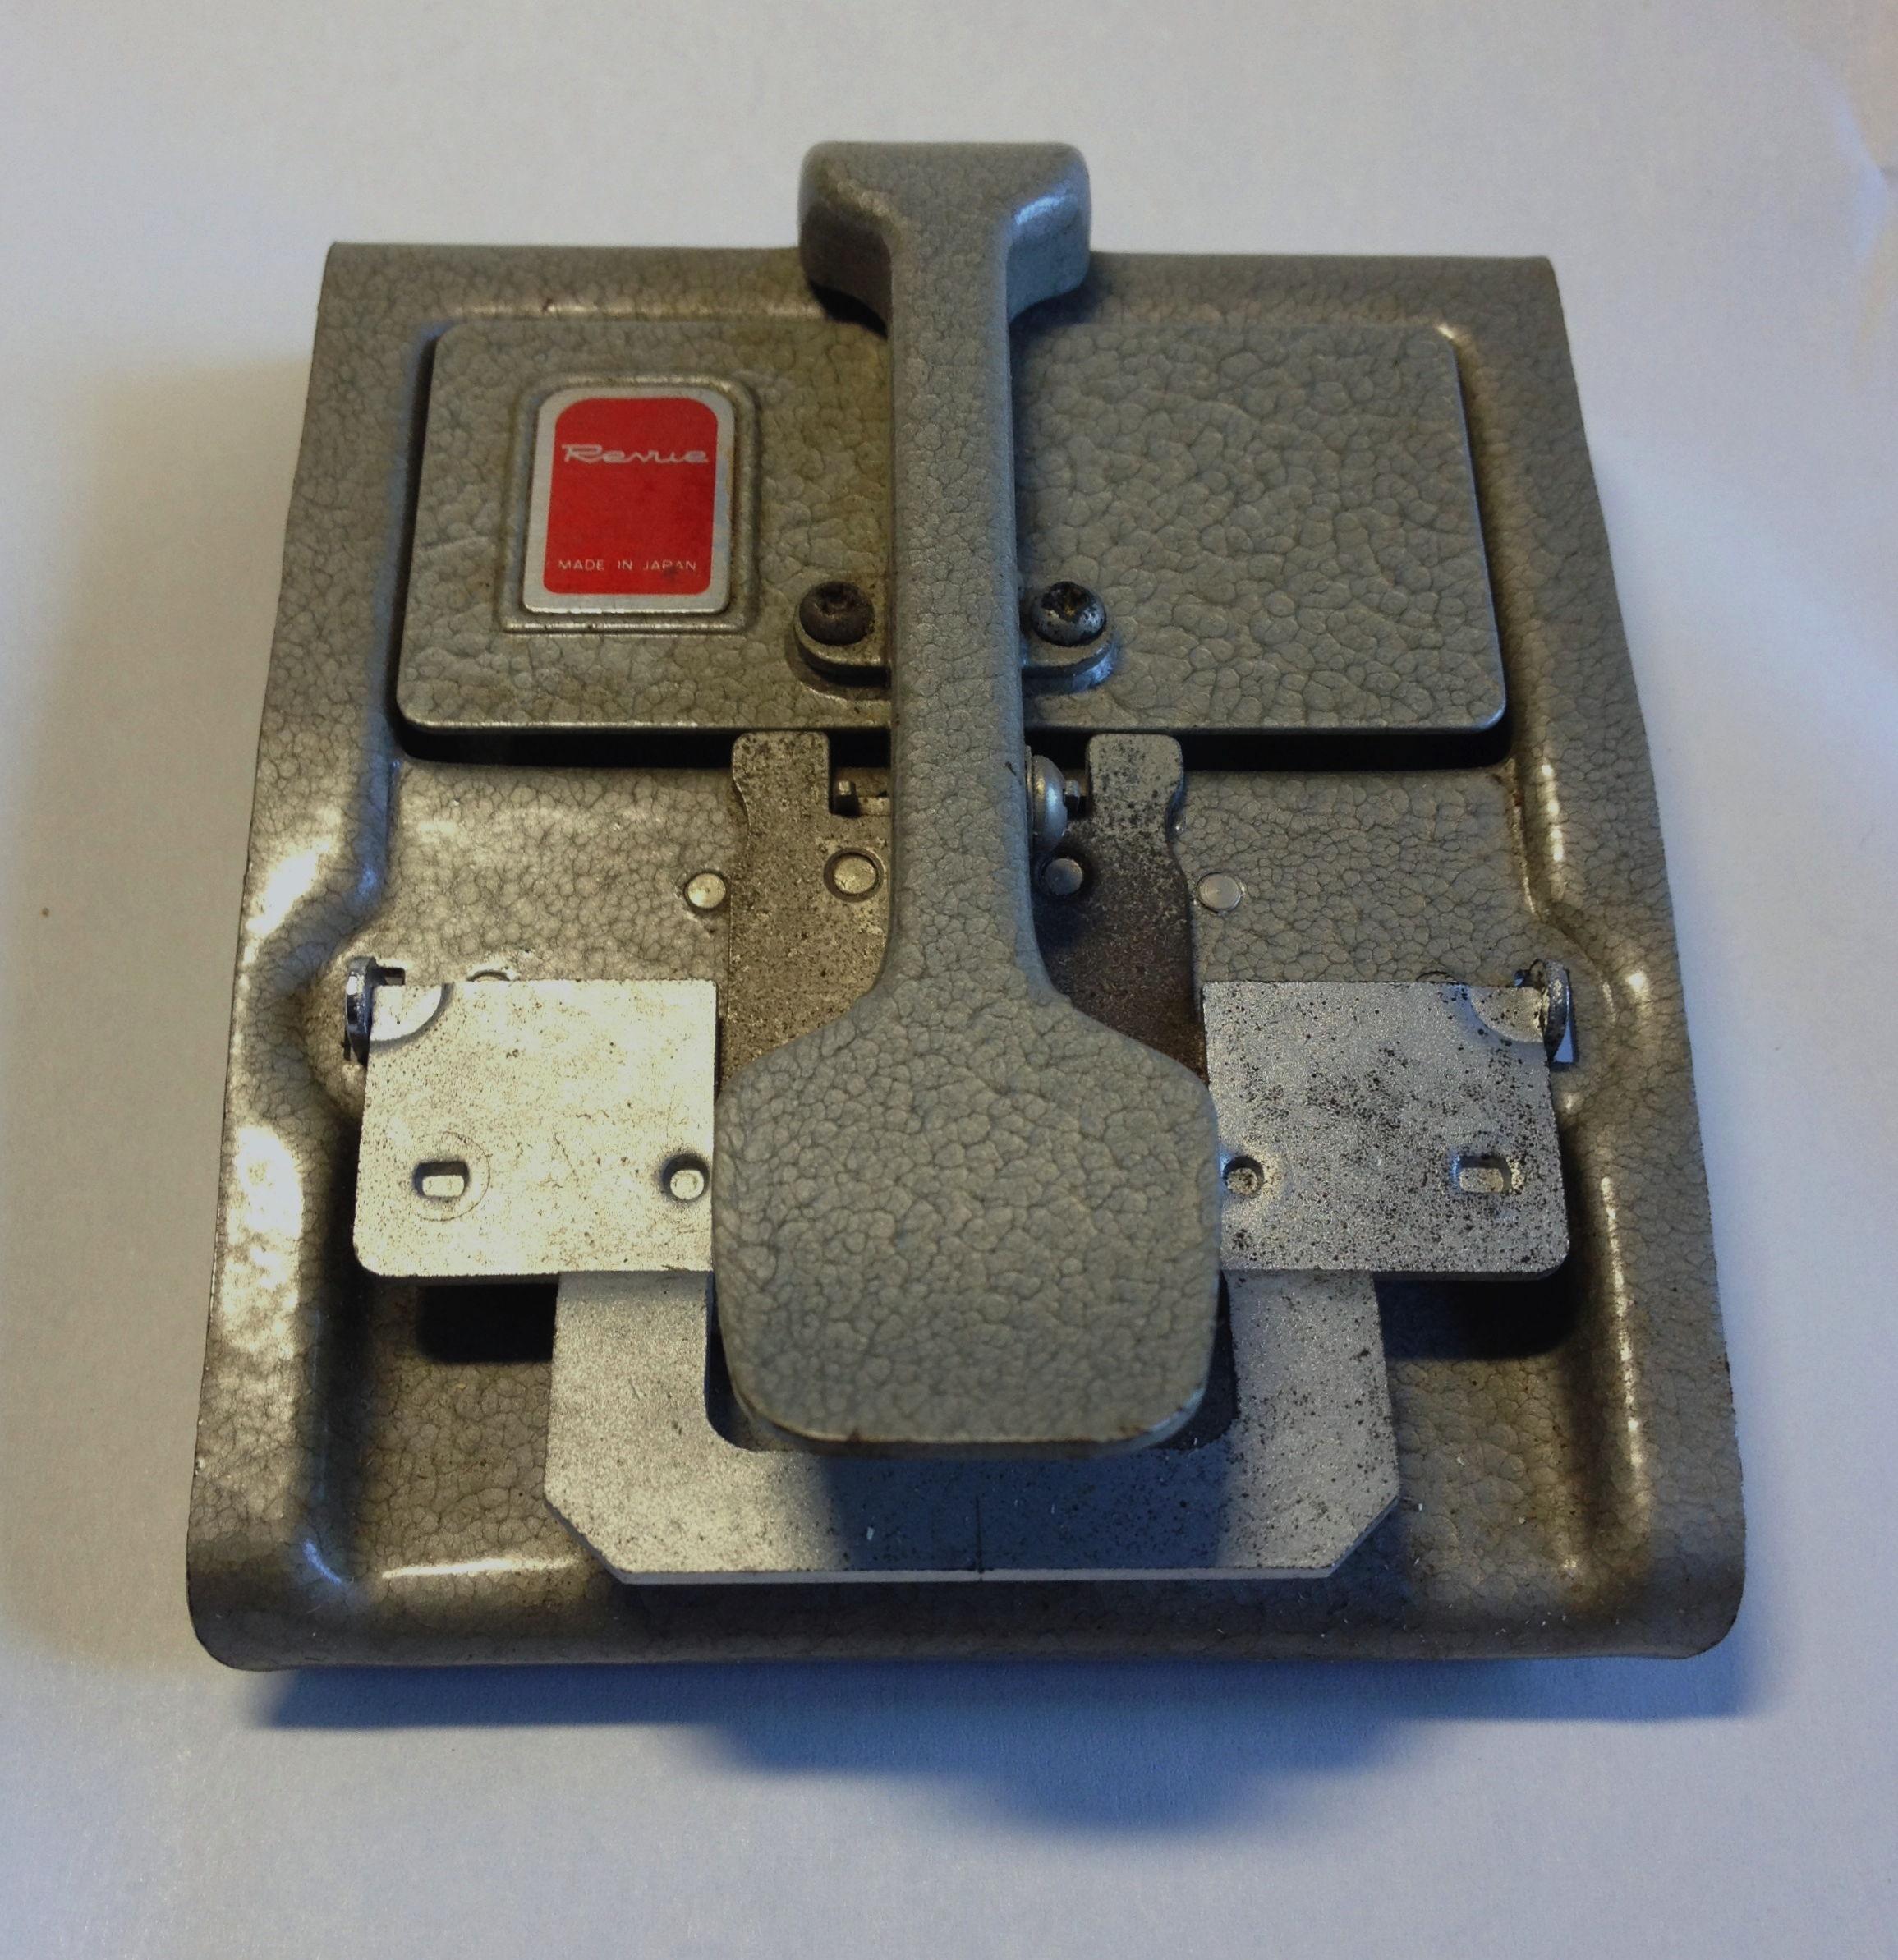 revue super 8 patch tape splicer anleitung mac thor. Black Bedroom Furniture Sets. Home Design Ideas